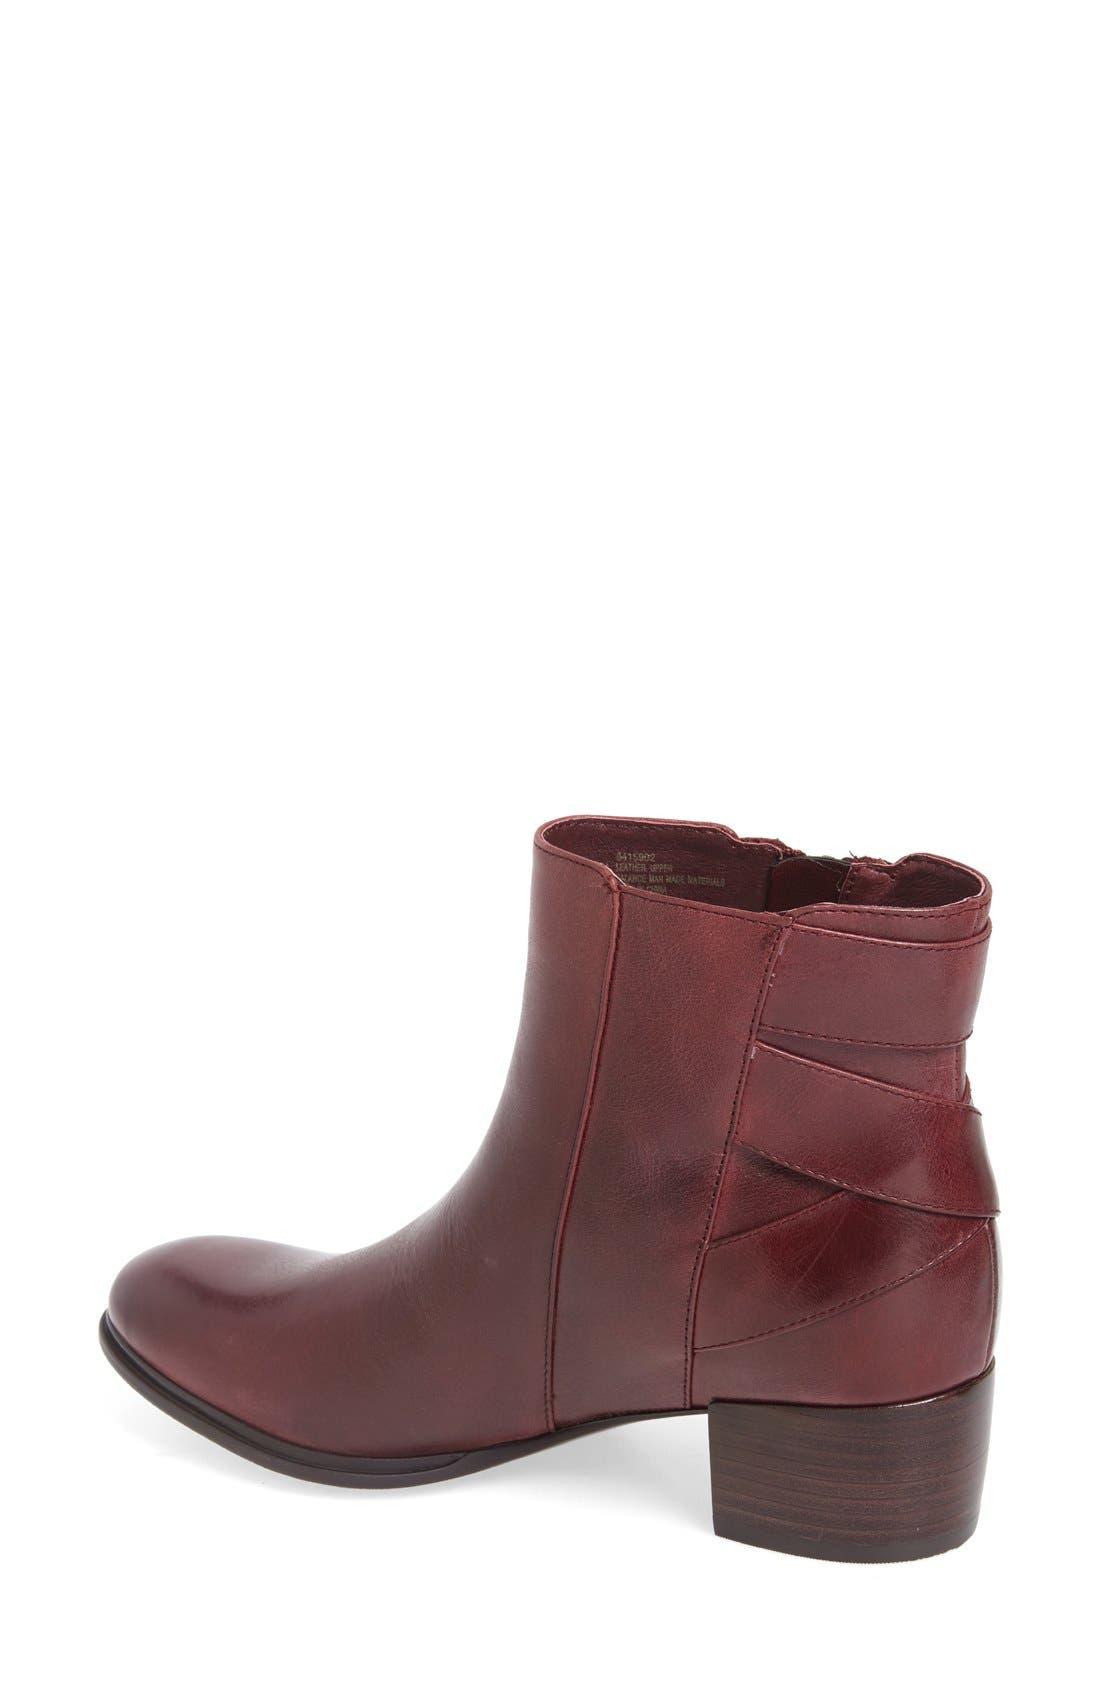 'Delta' Bootie,                             Alternate thumbnail 2, color,                             Burgundy Leather